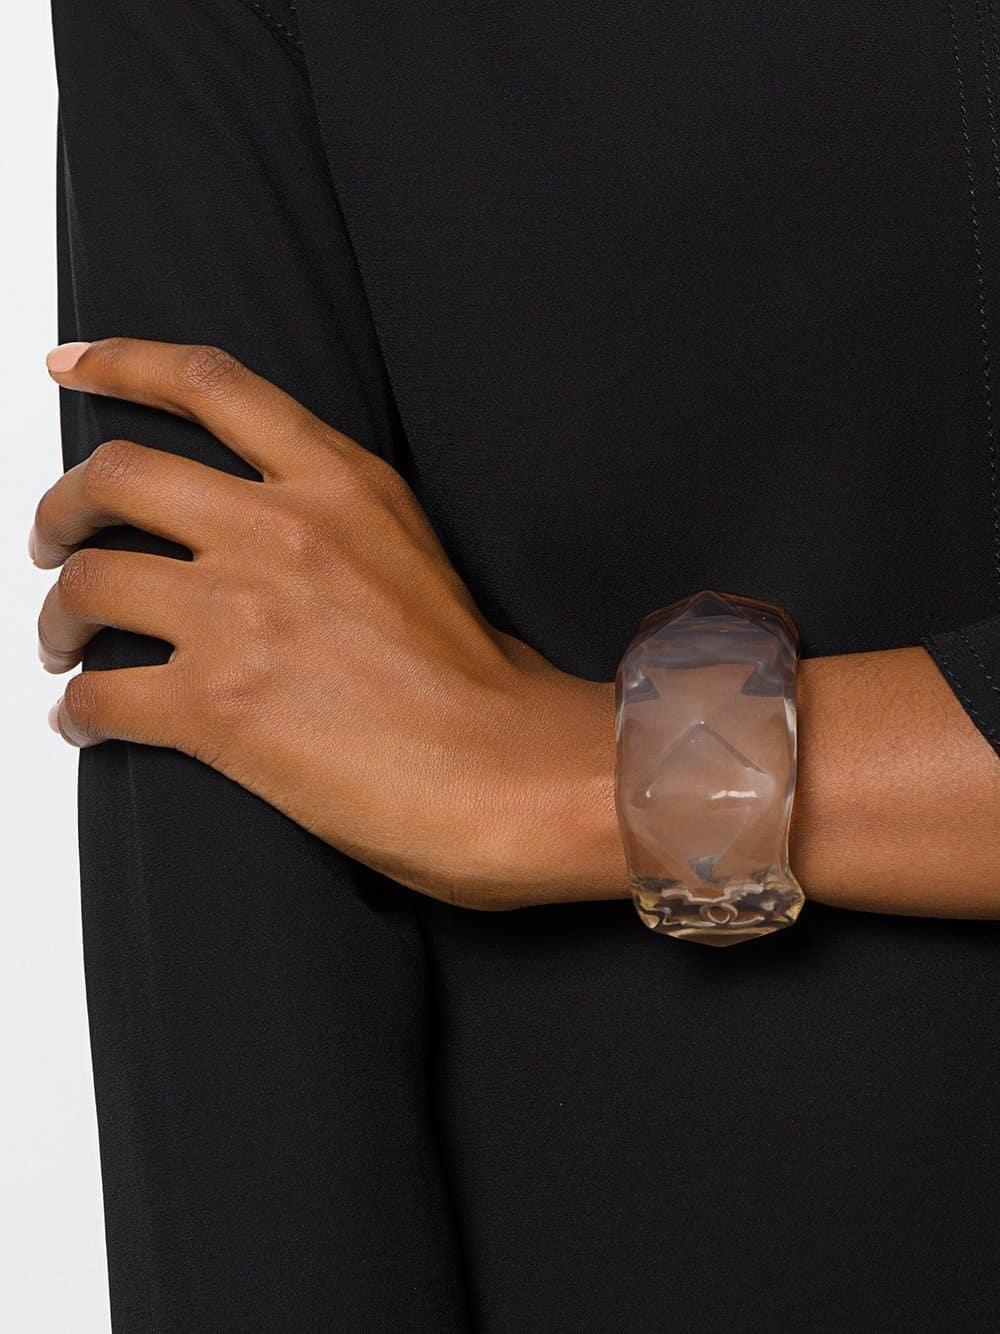 Chanel vintage ice resin bracelet cuff 2010